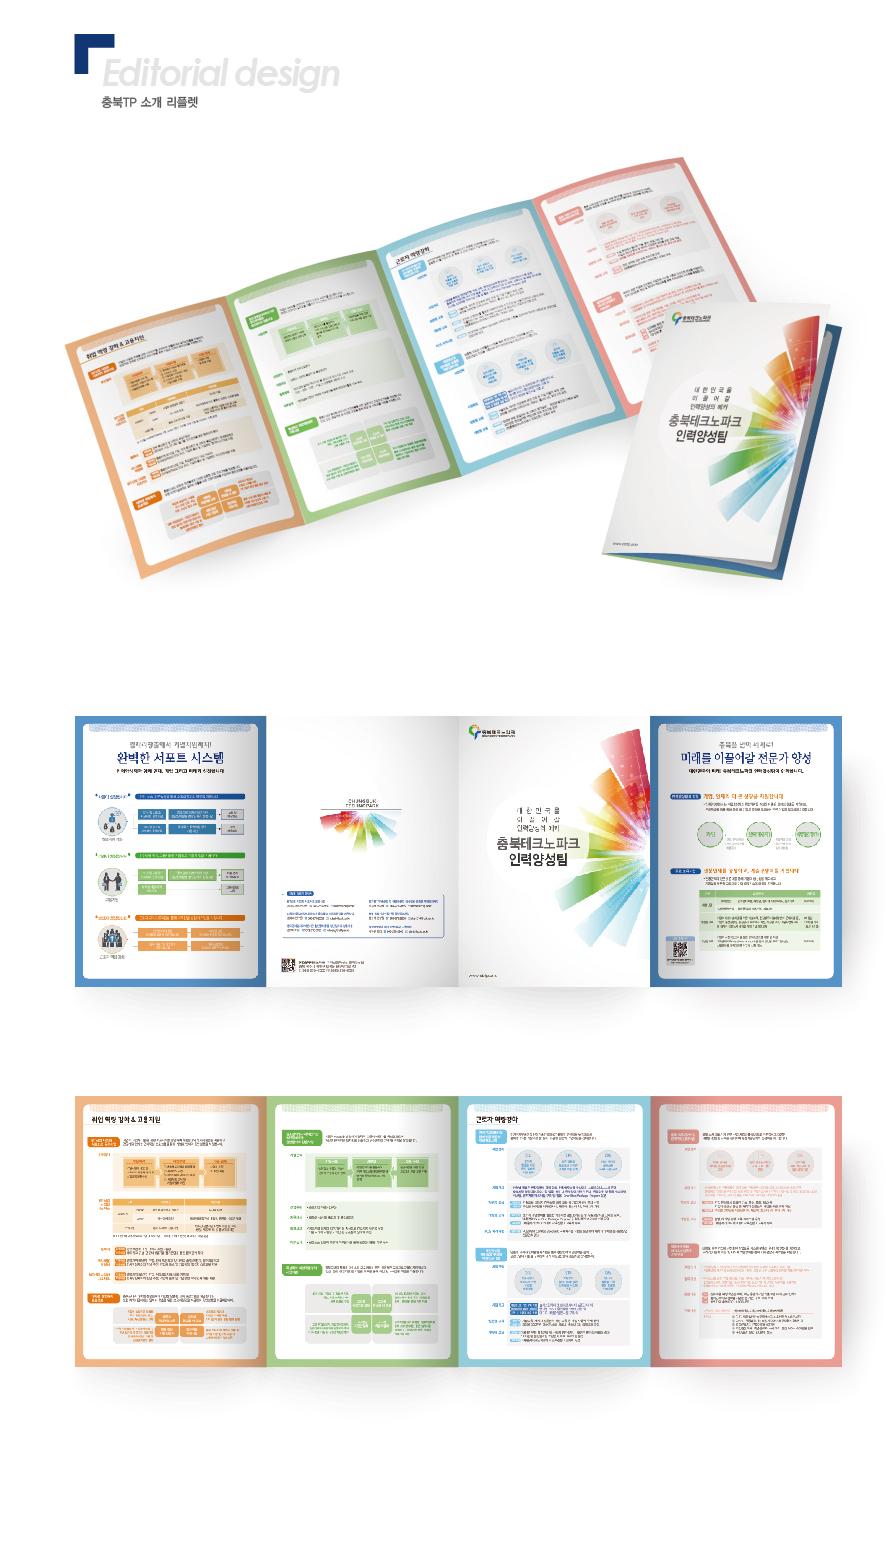 02 Editorial design-08.jpg